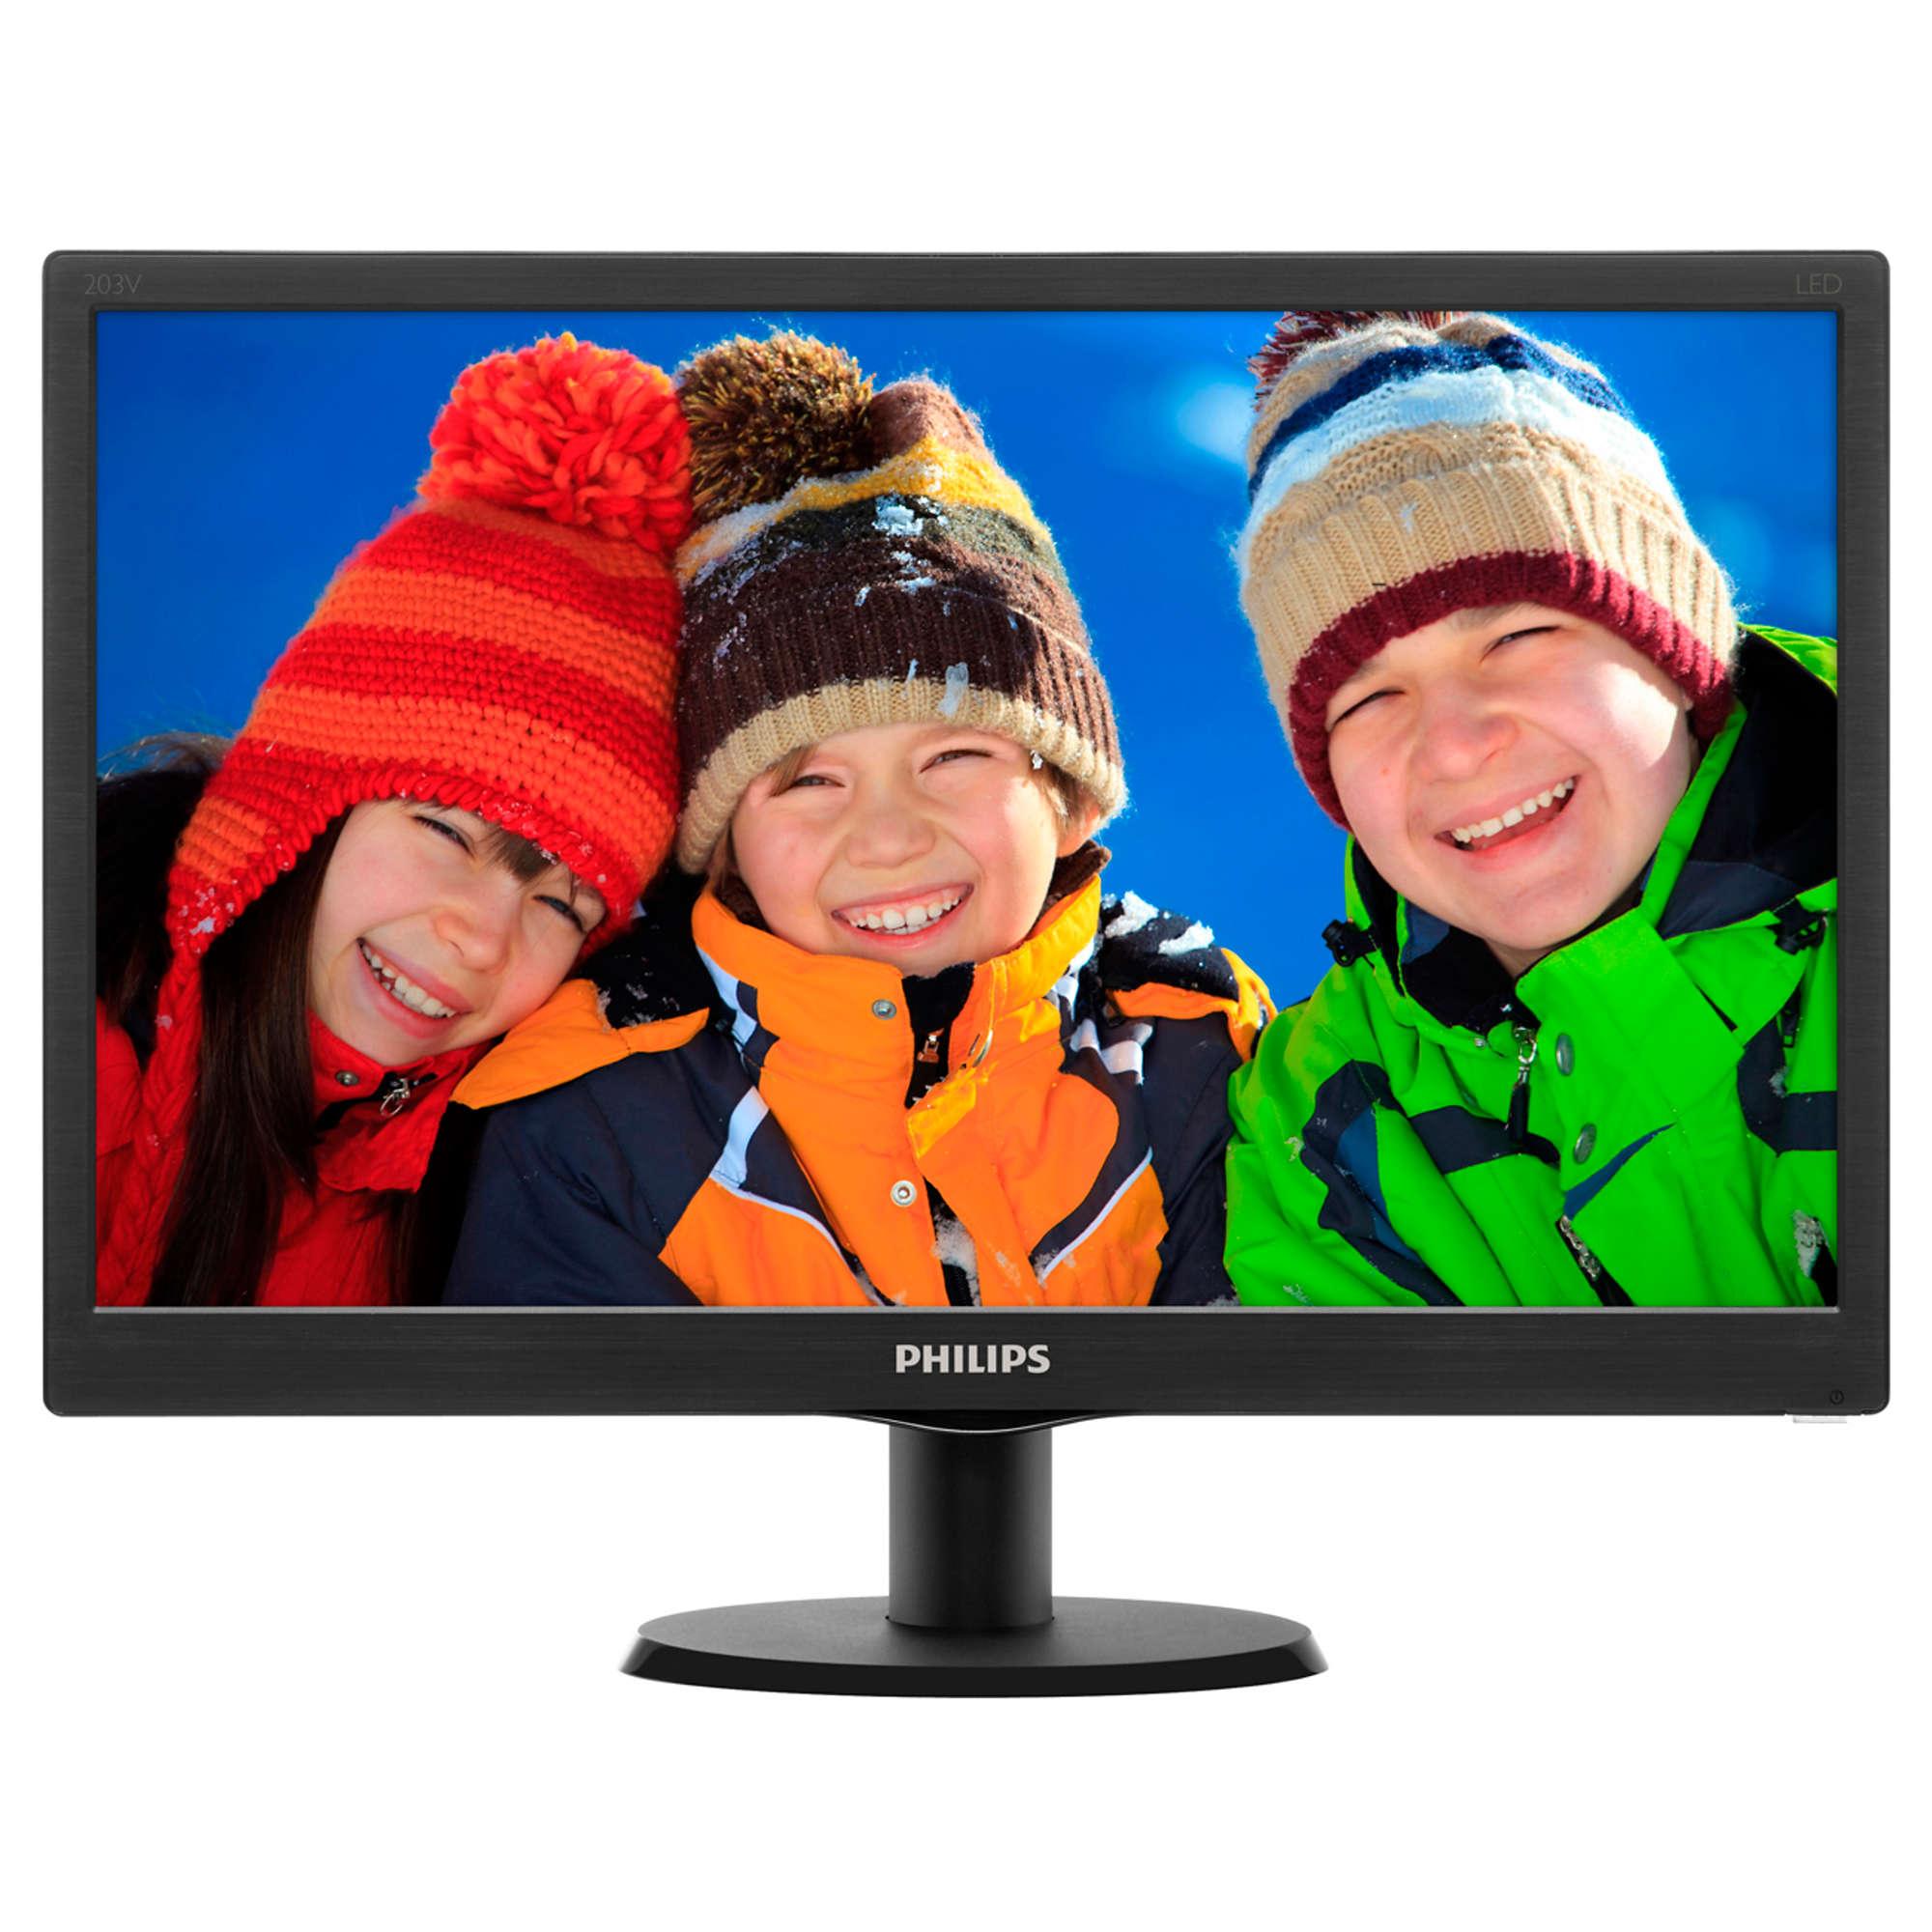 Philips LCD 19.5 203V5LSB26 1600x900 VGA